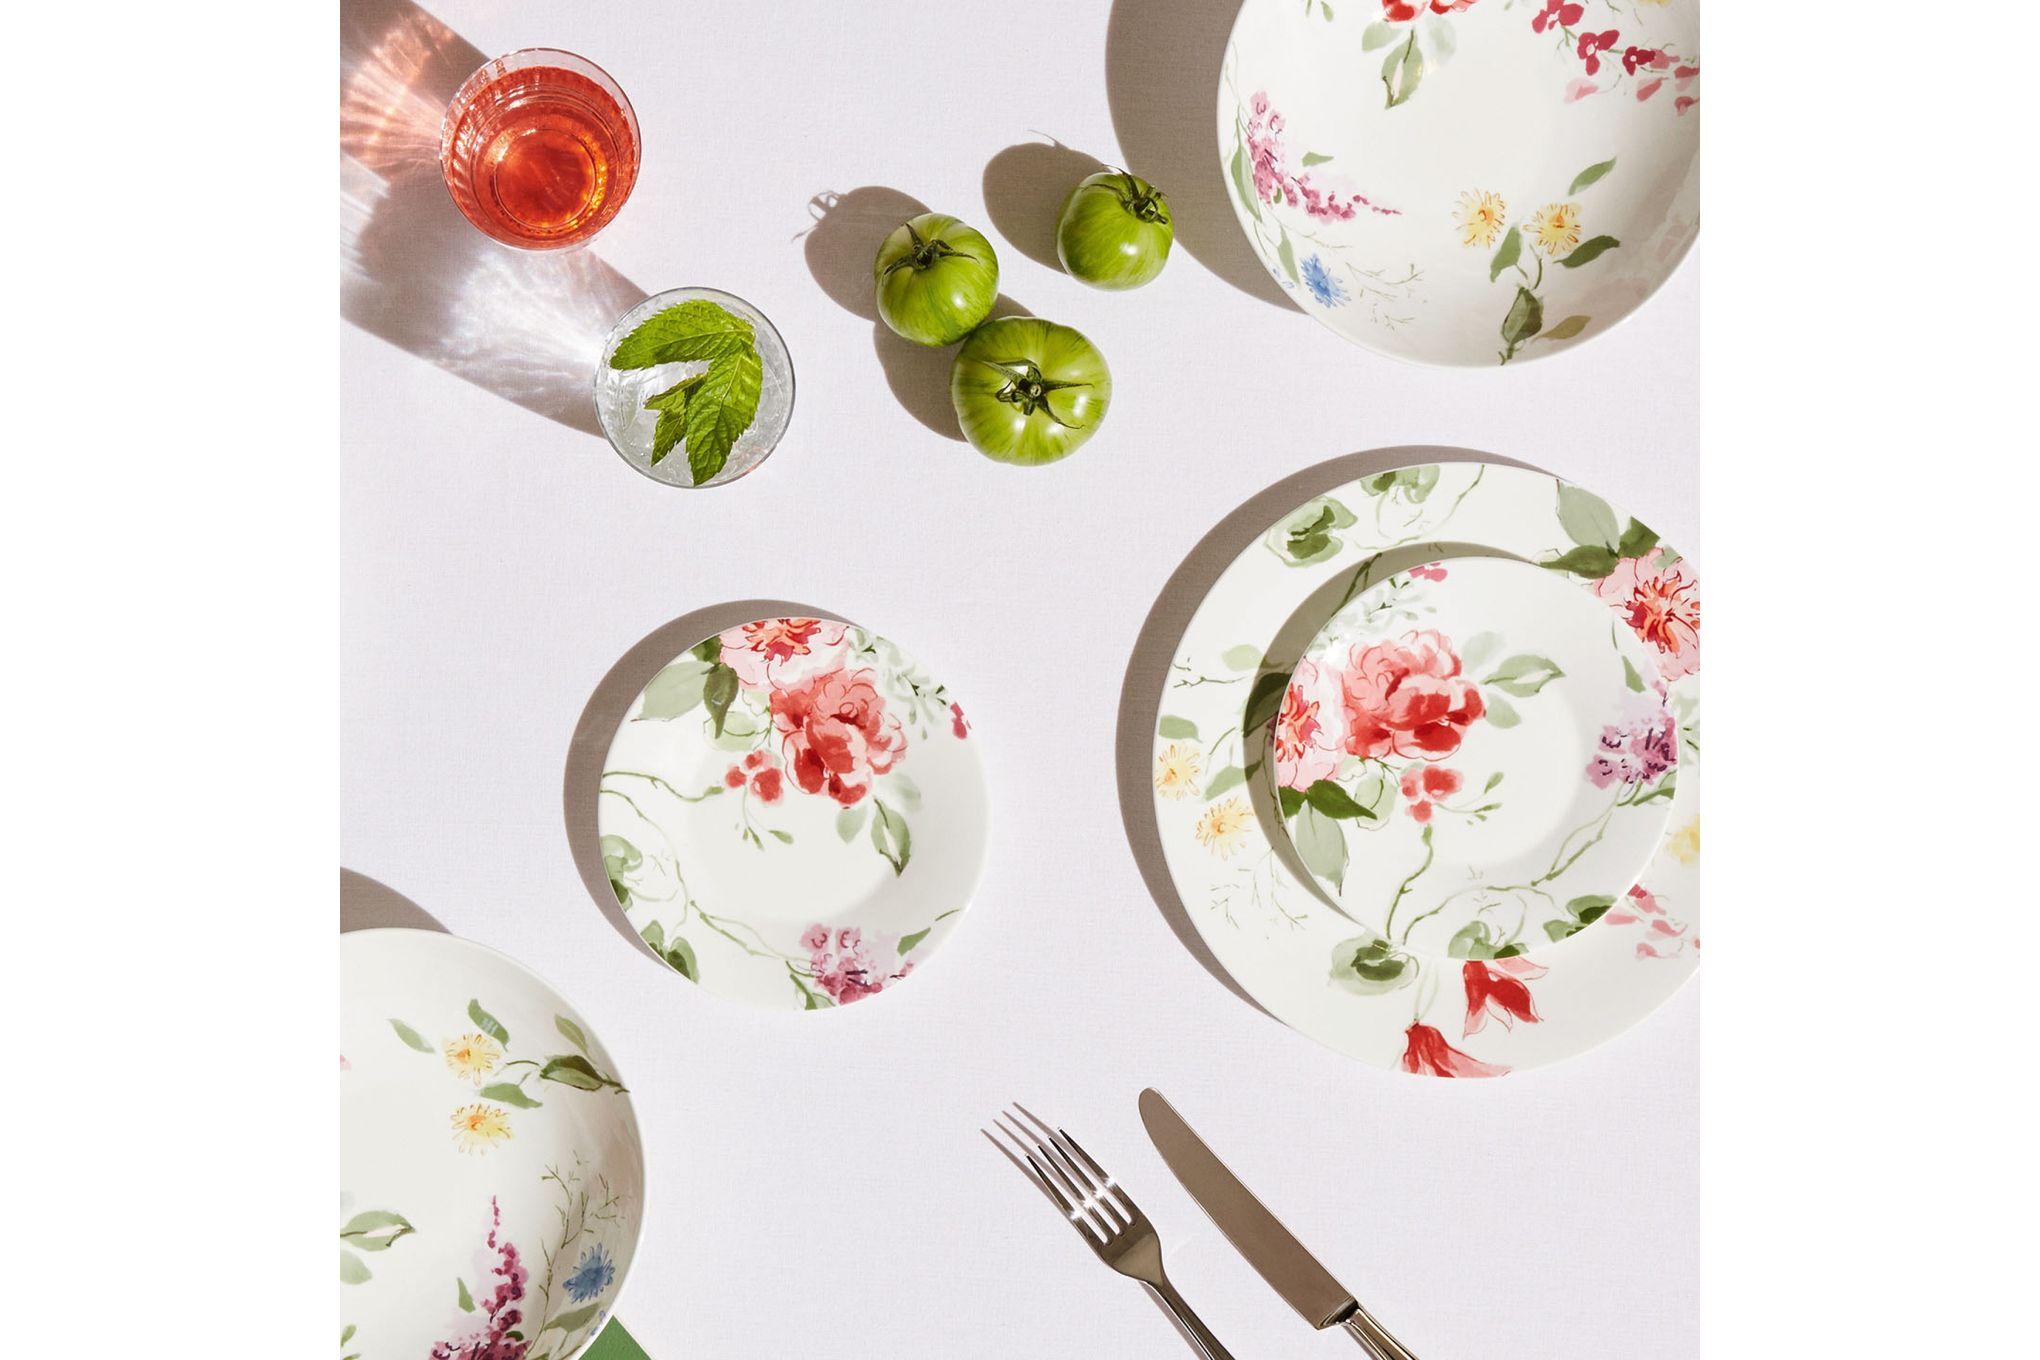 Jasper Conran for Wedgwood Floral Bowl 22cm thumb 3